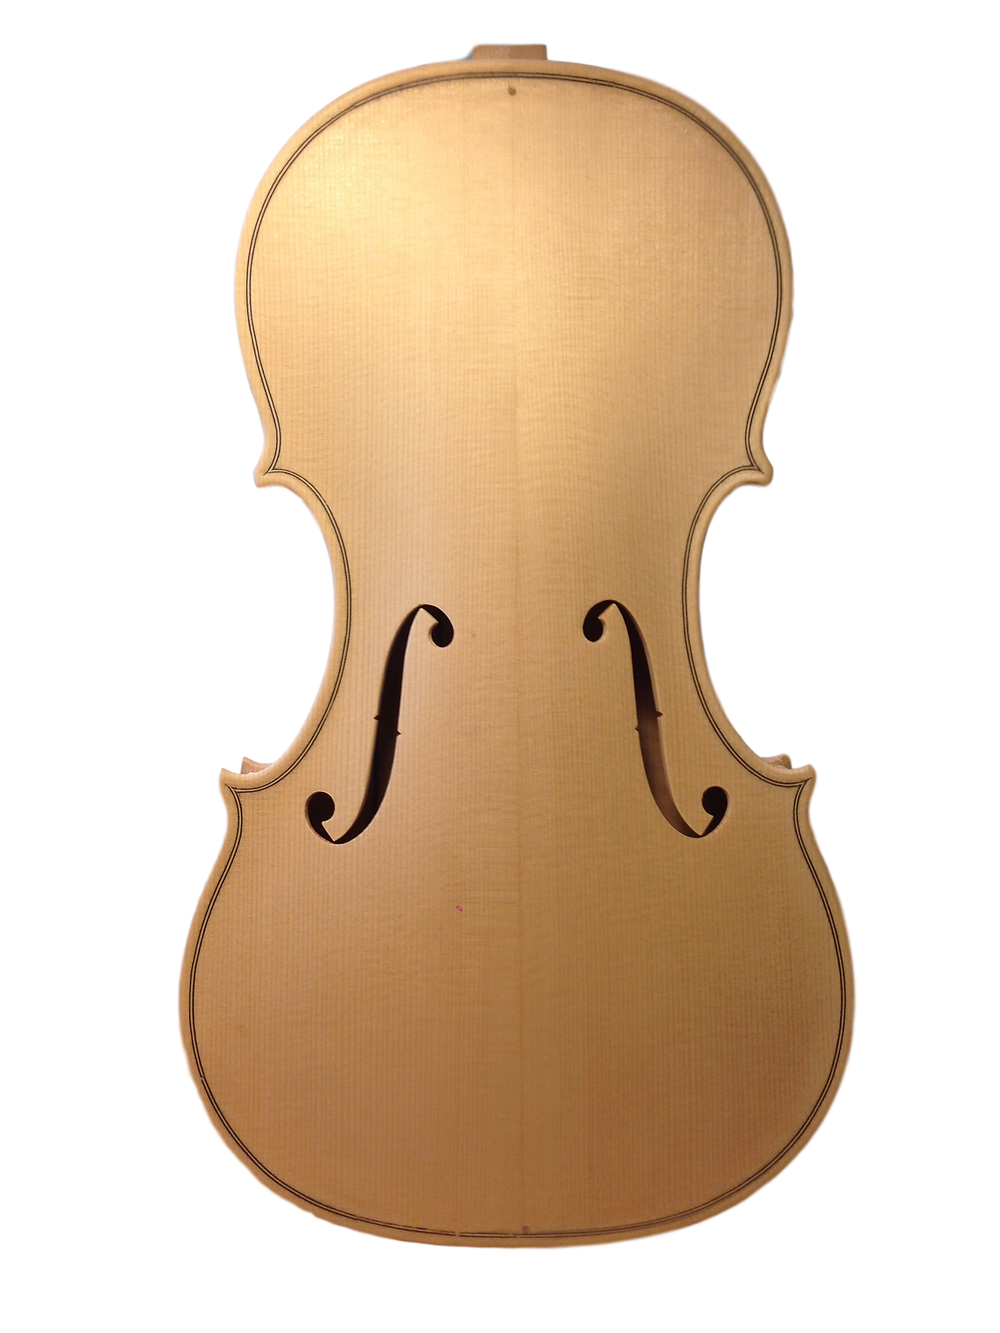 Kemp copy in the white Per Ovesen Violin Maker